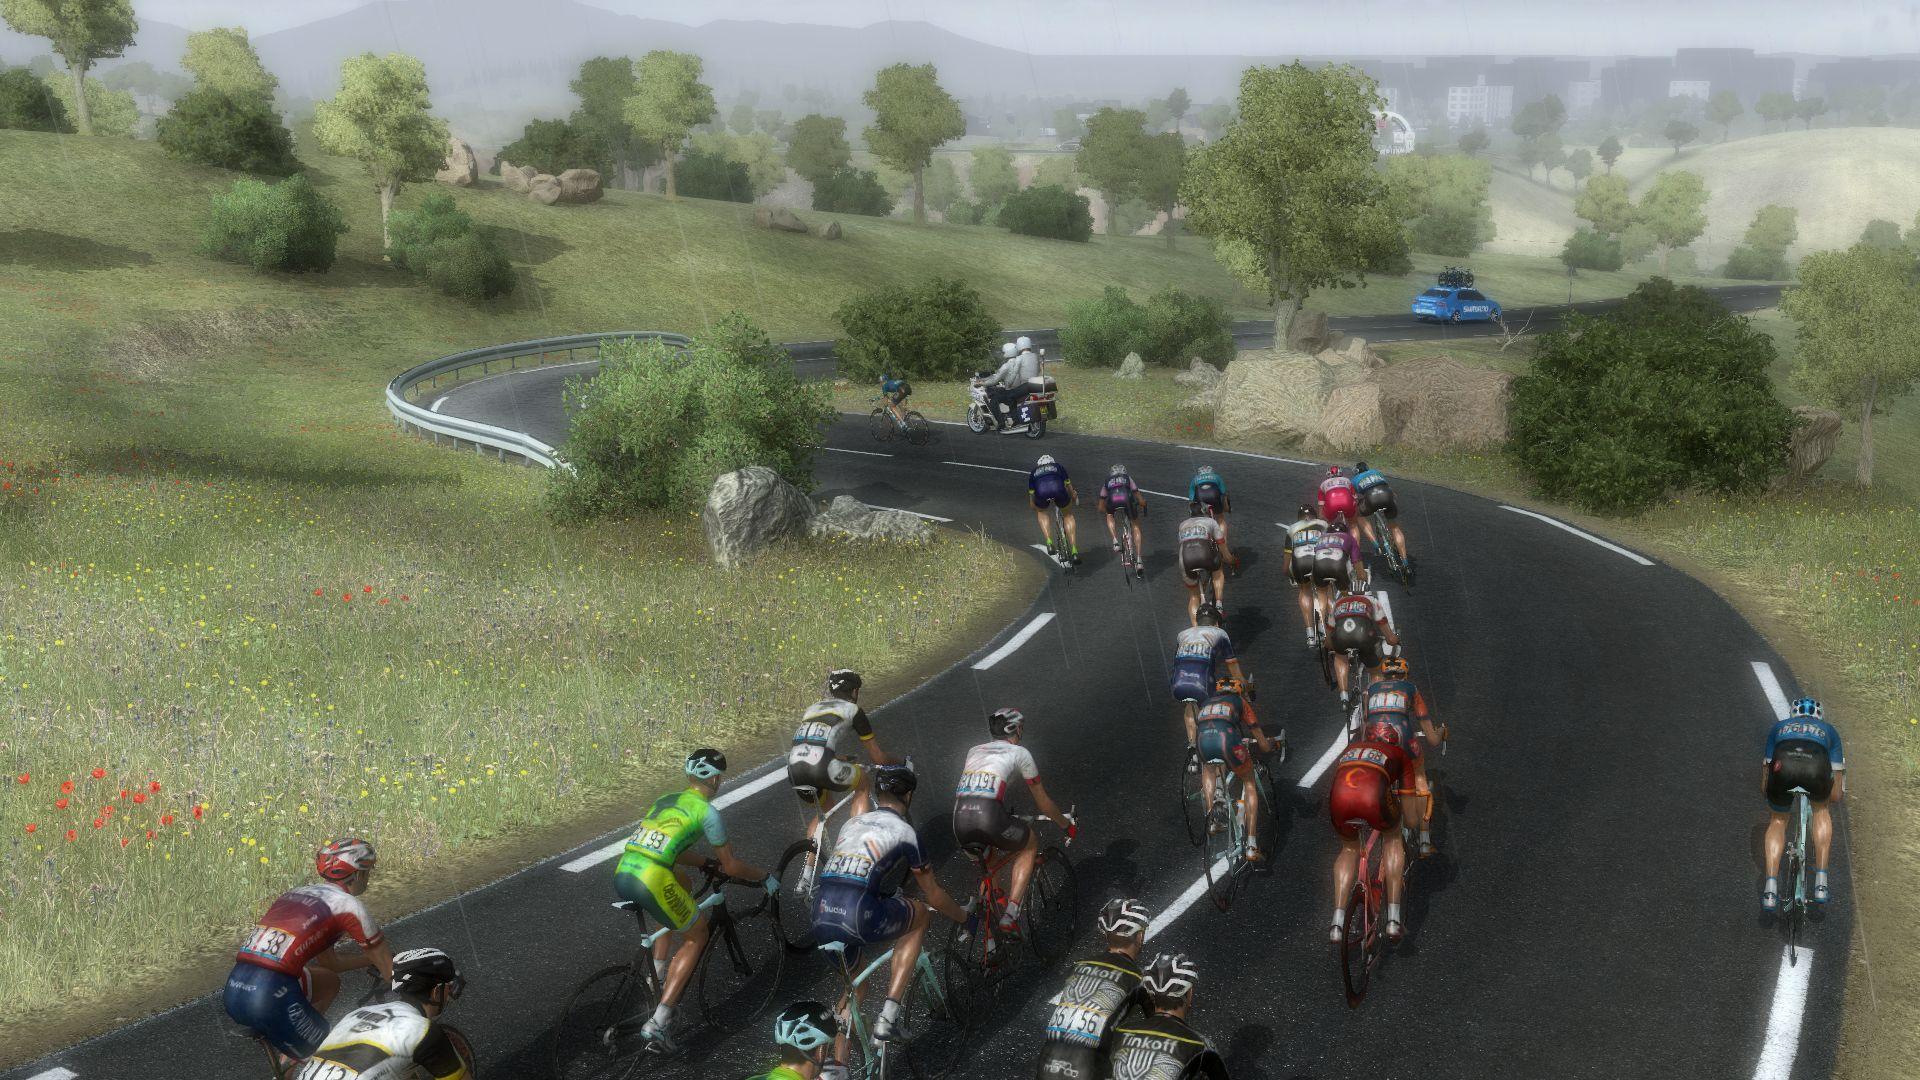 pcmdaily.com/images/mg/2020/Reports/GTM/Giro/S12/mg20_giro_s12_41.jpg